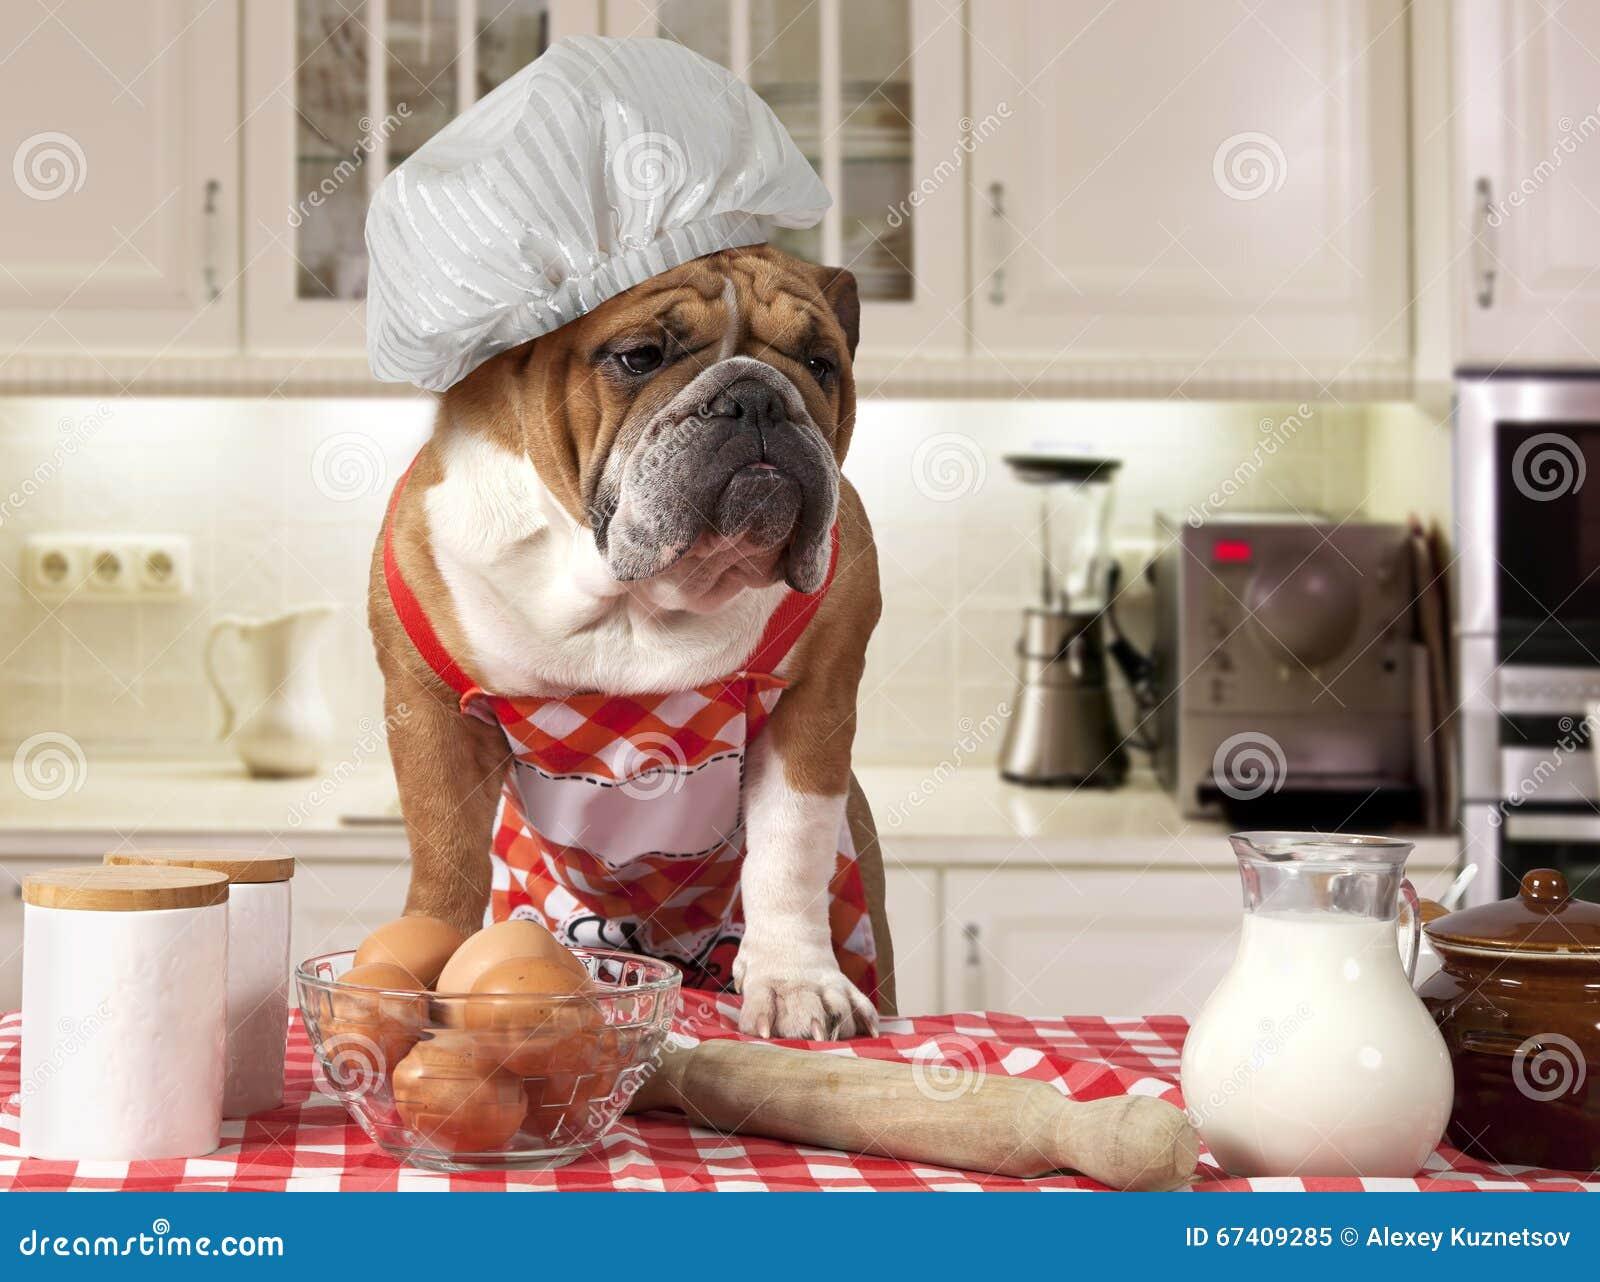 English Bulldog In The Kitchen Stock Photo Image 67409285